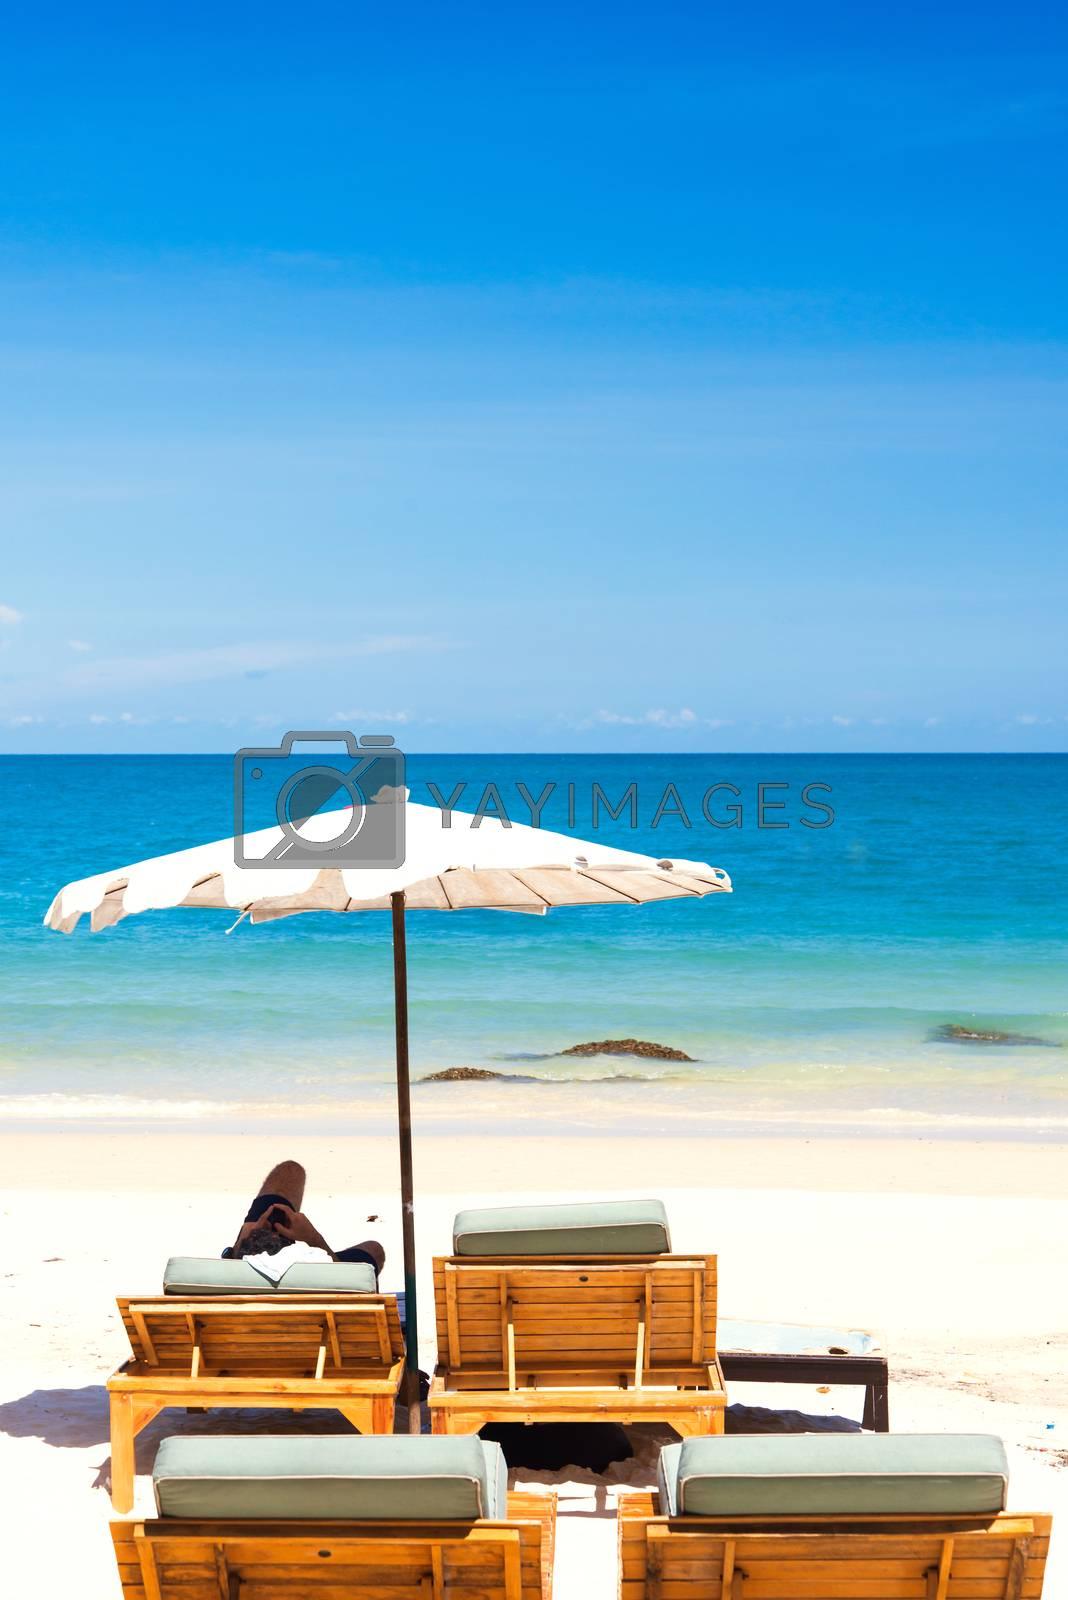 Beach chair and umbrella on sand beach. by jakgree